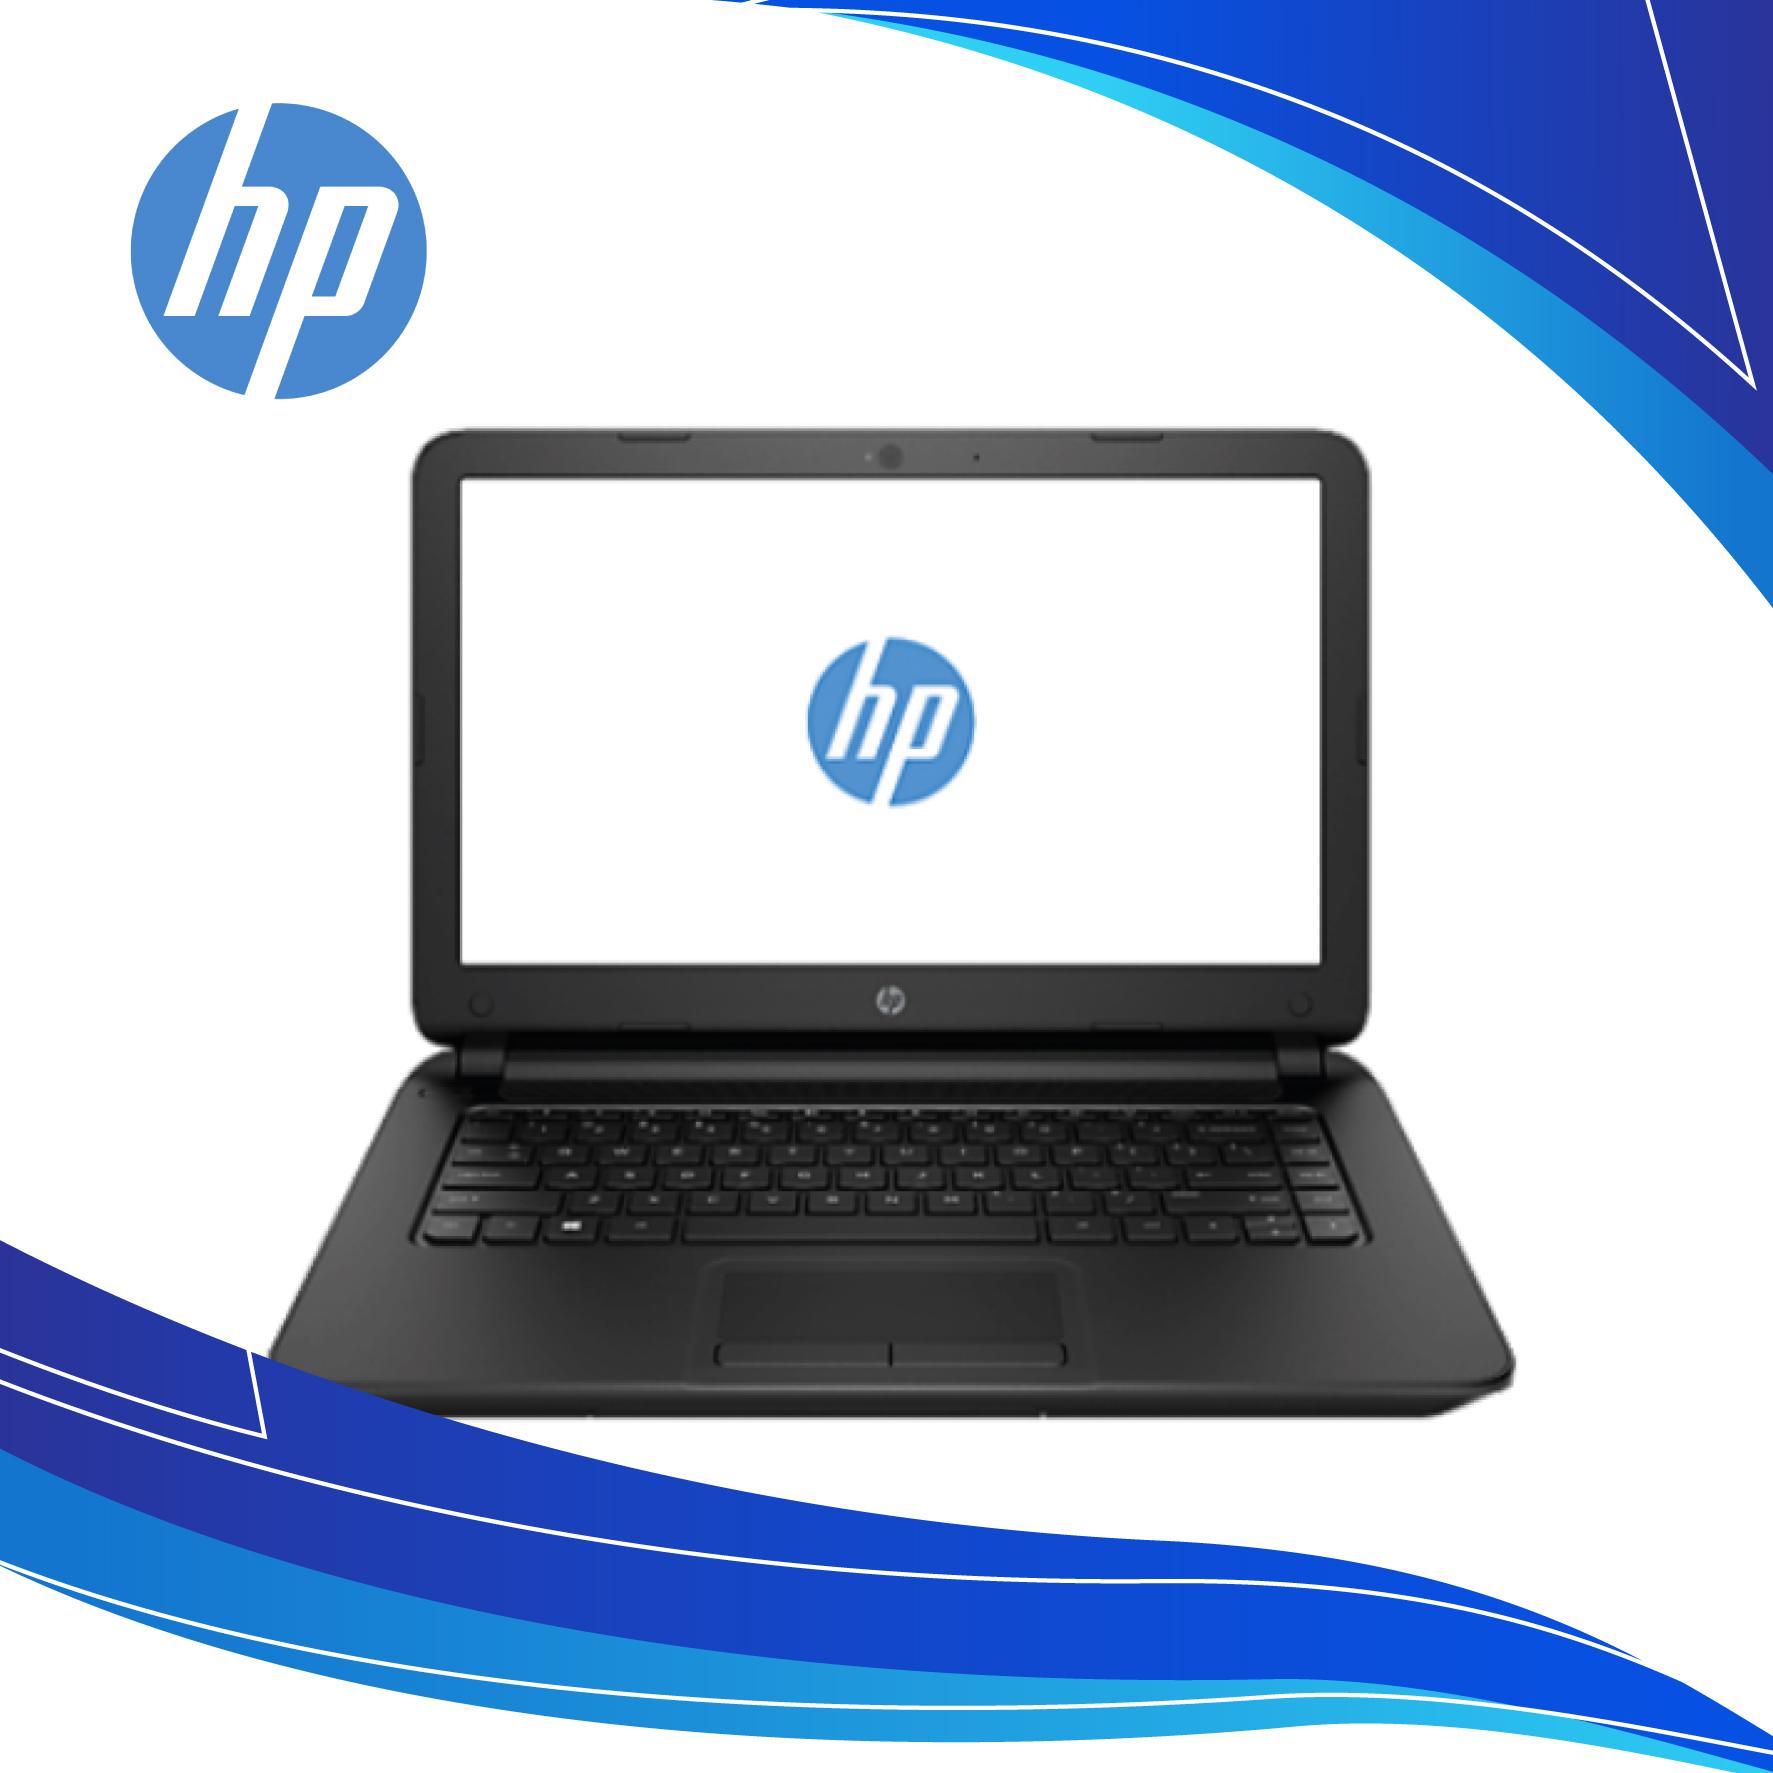 Computador Portátil HP 245 G5 AMD A8 7410 | hp portatil alkosto